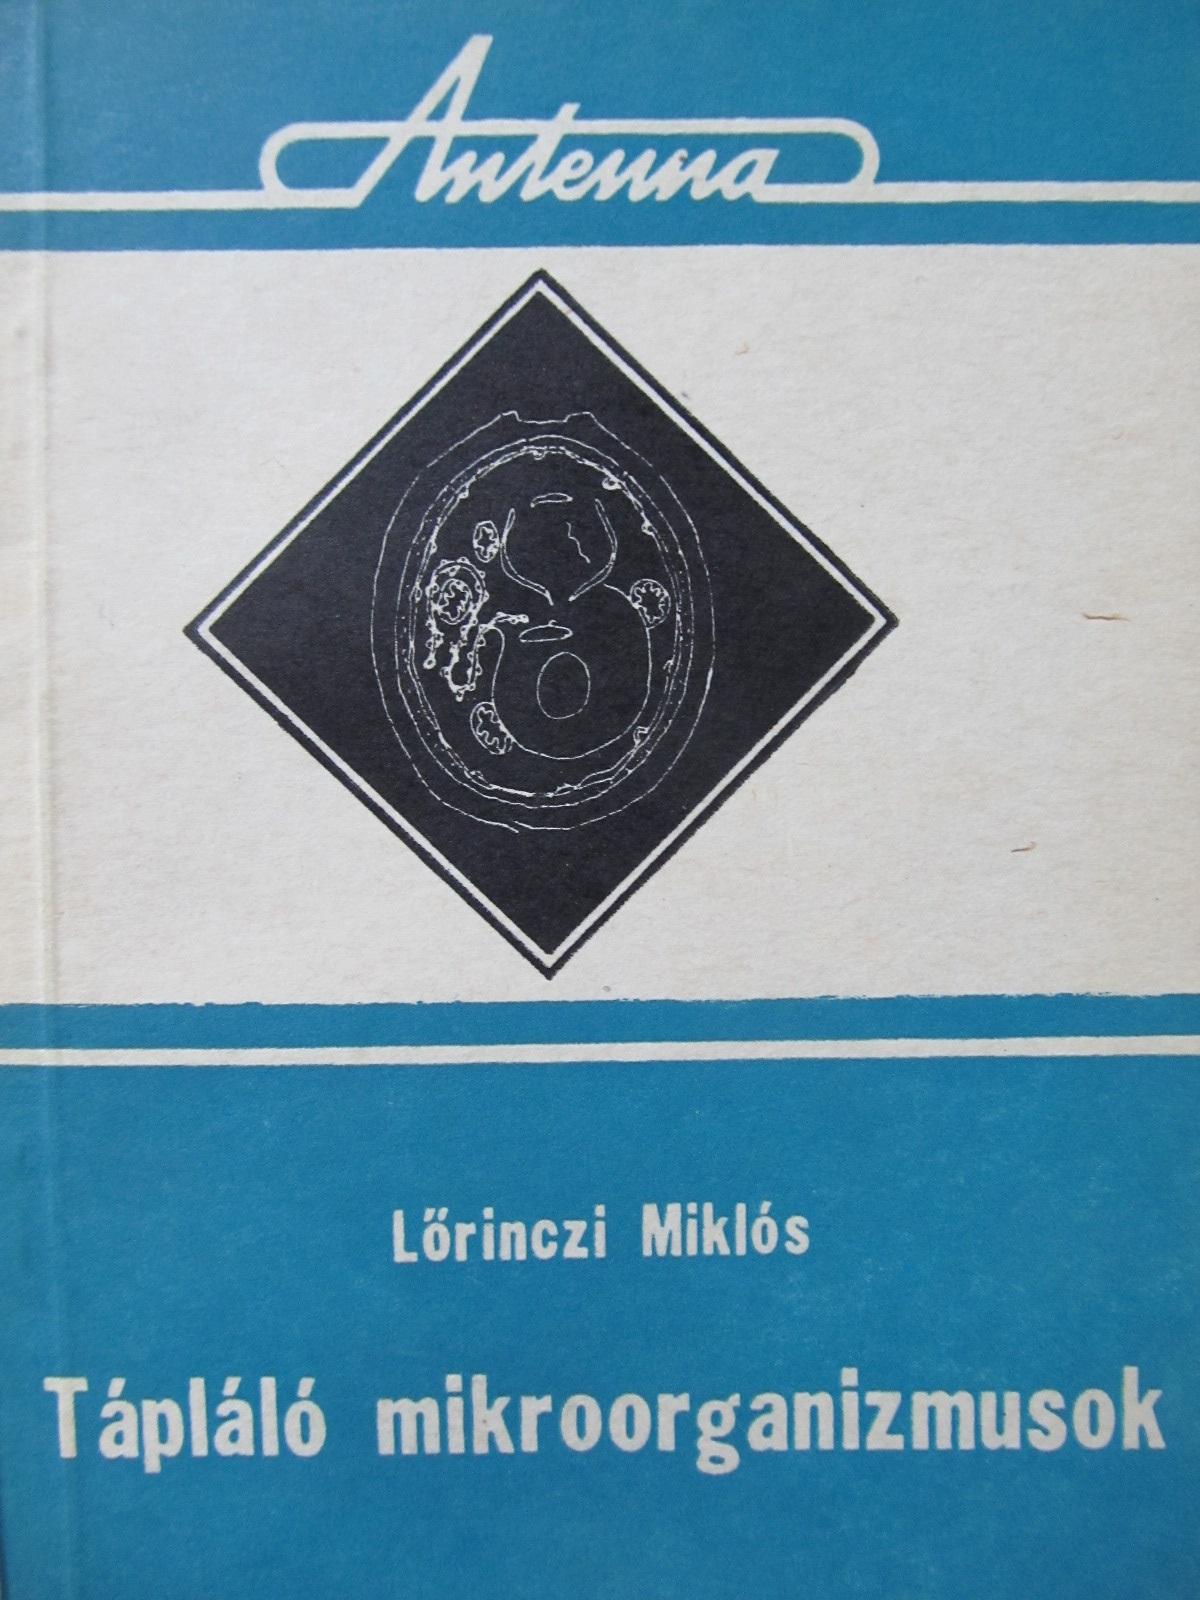 Taplalo mikroorganizmusok - Lorinczi Miklos | Detalii carte